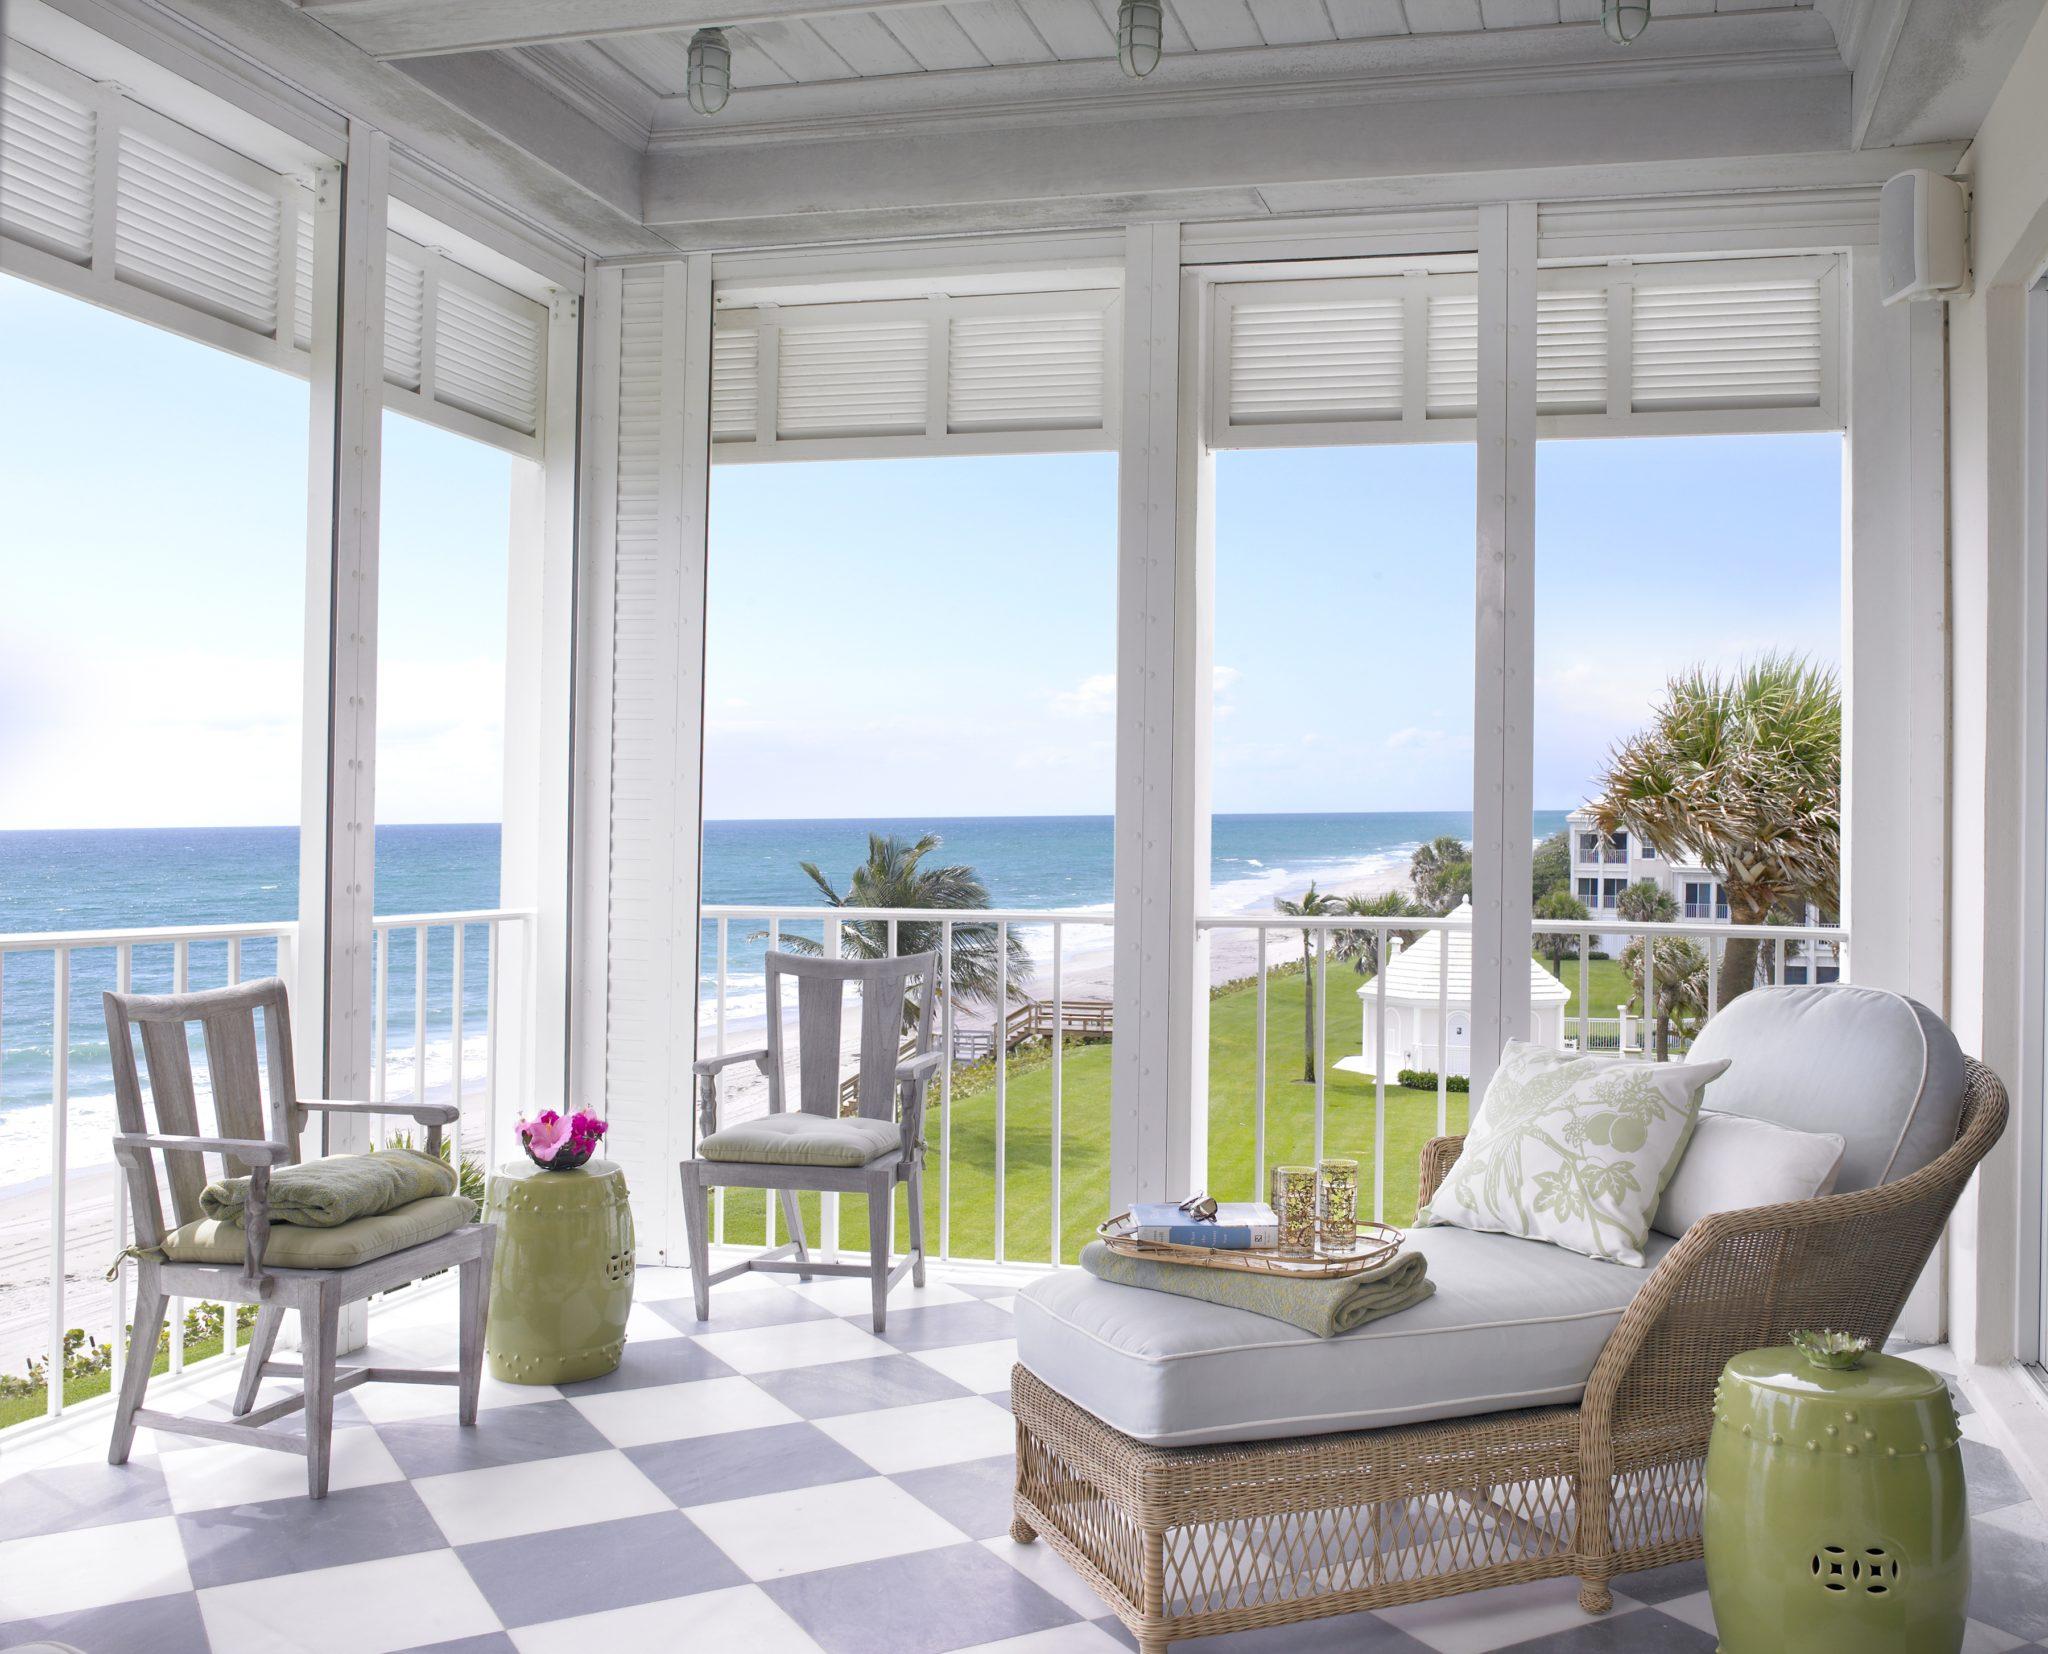 Outdoor sitting room by Jennifer Garrigues Interior Design